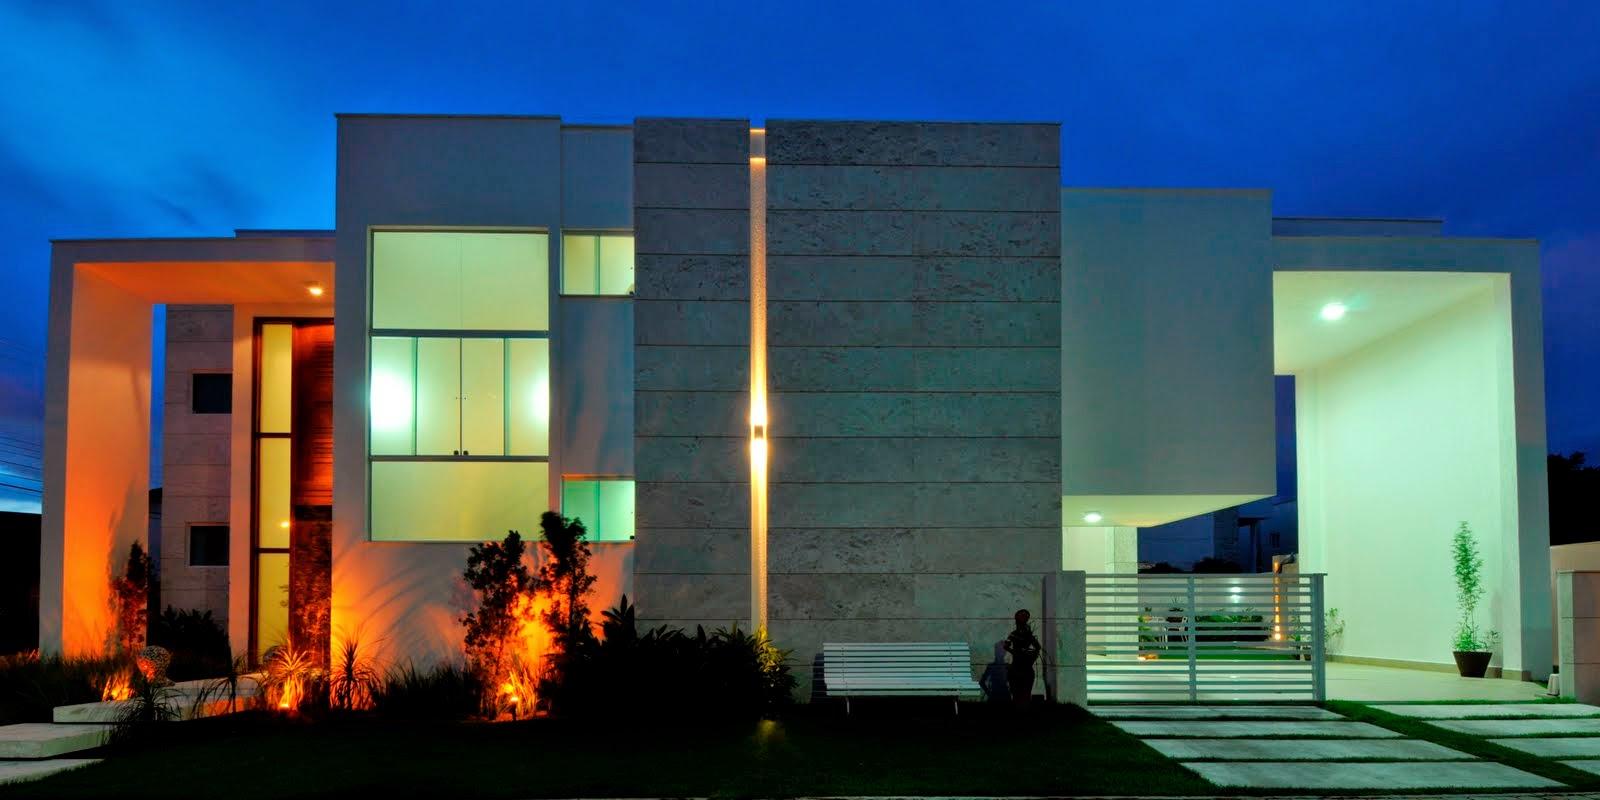 Fachada moderna fachadas de casas tattoo design bild for Casa moderna wallpaper